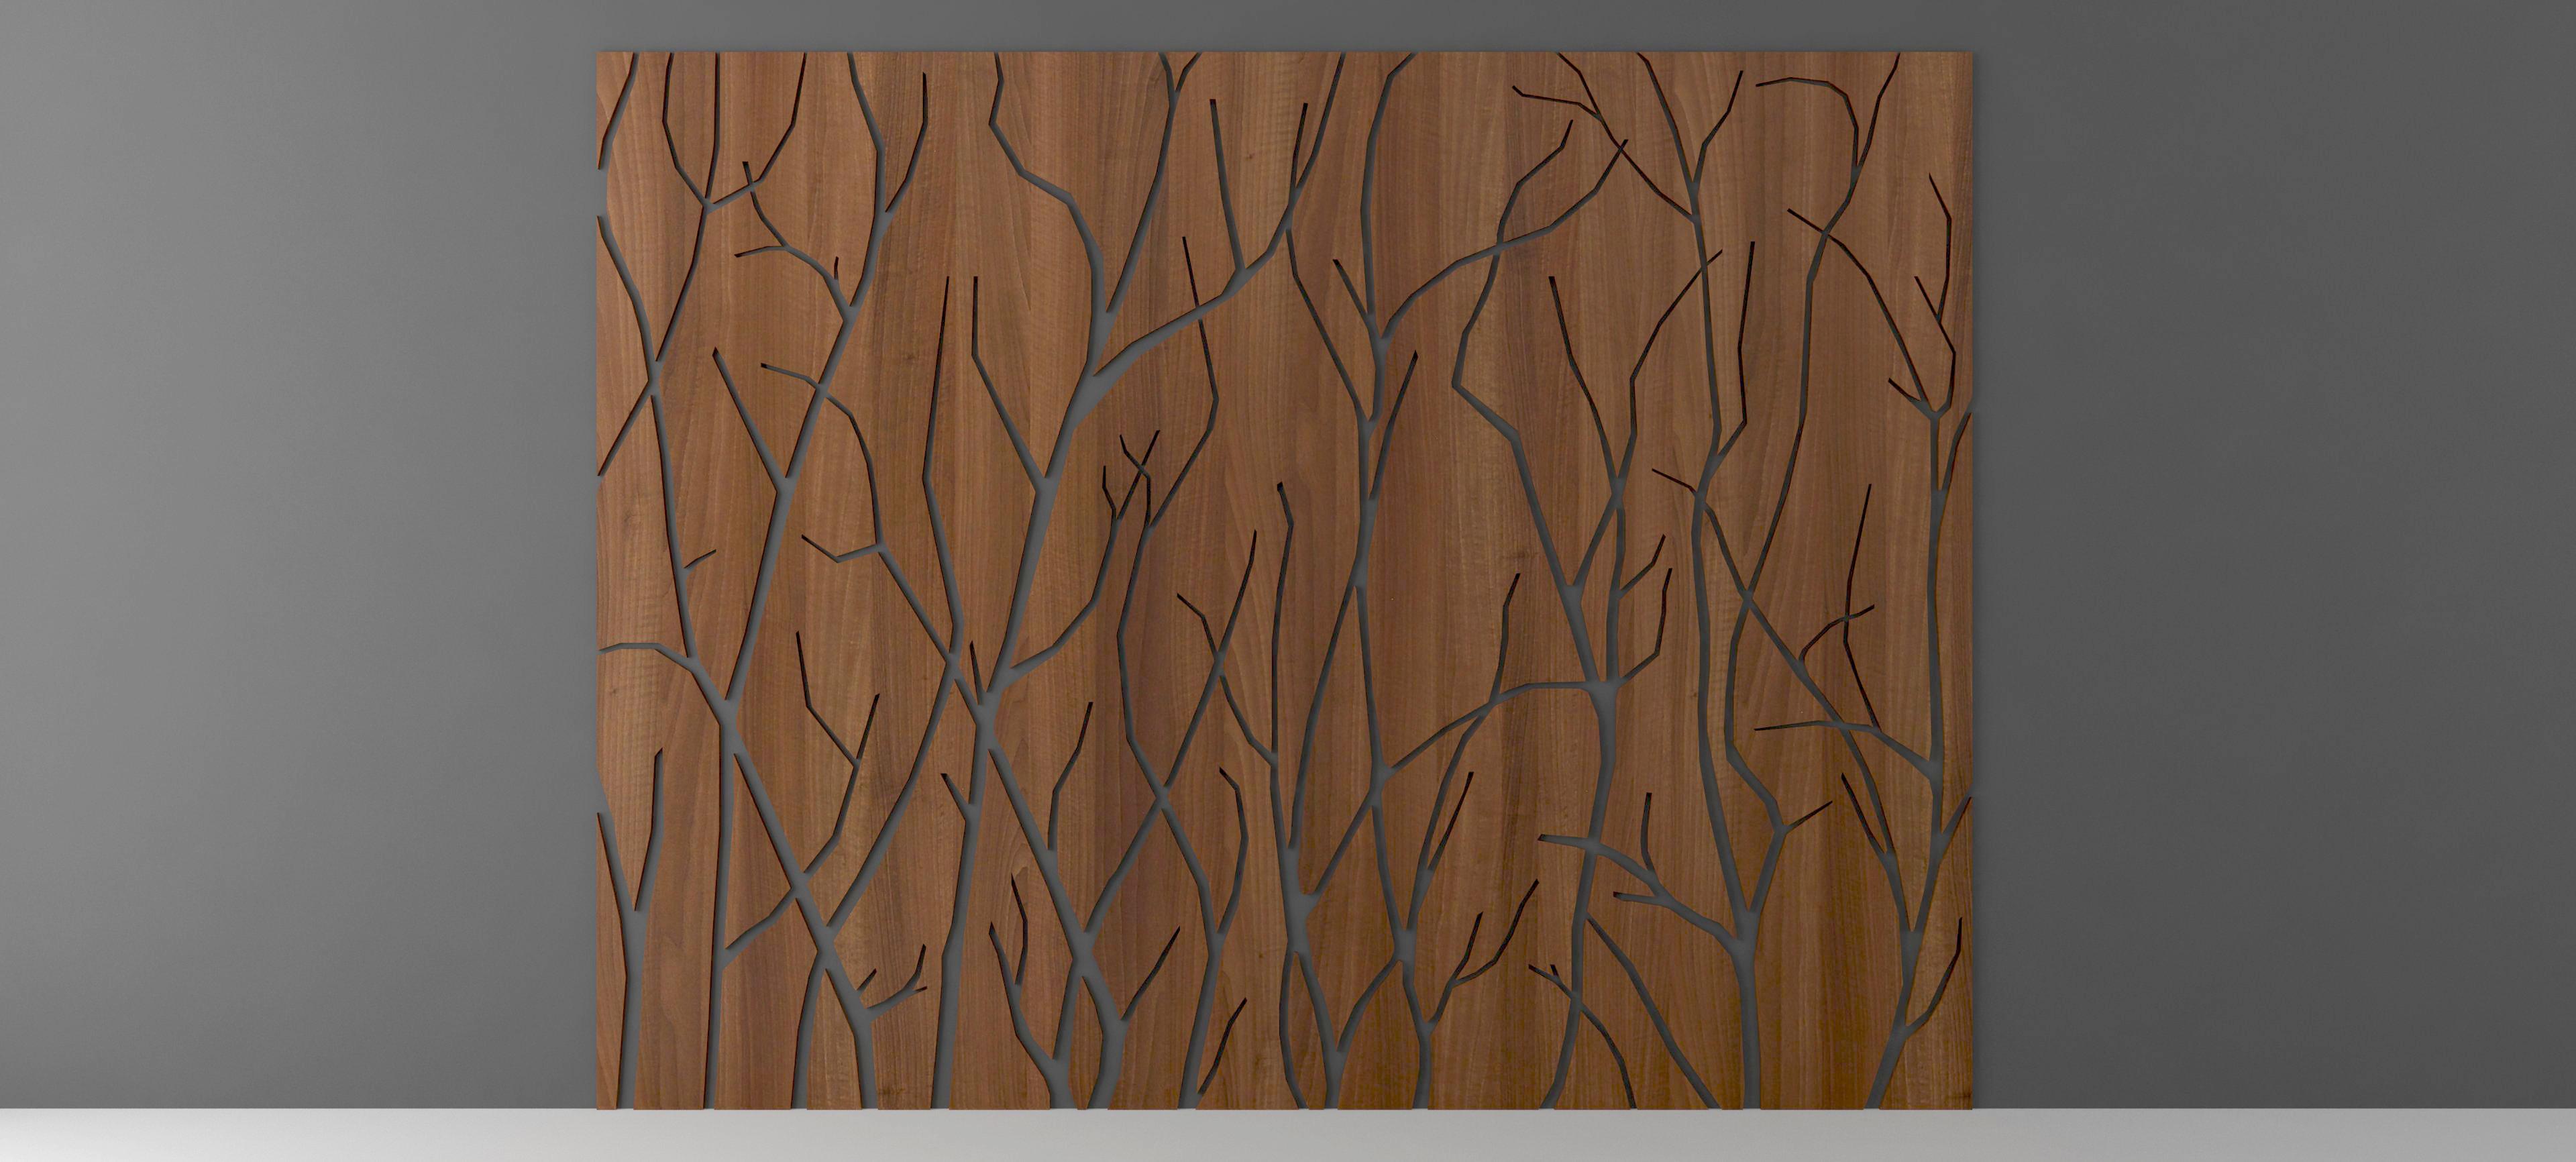 ART Series | FOREST